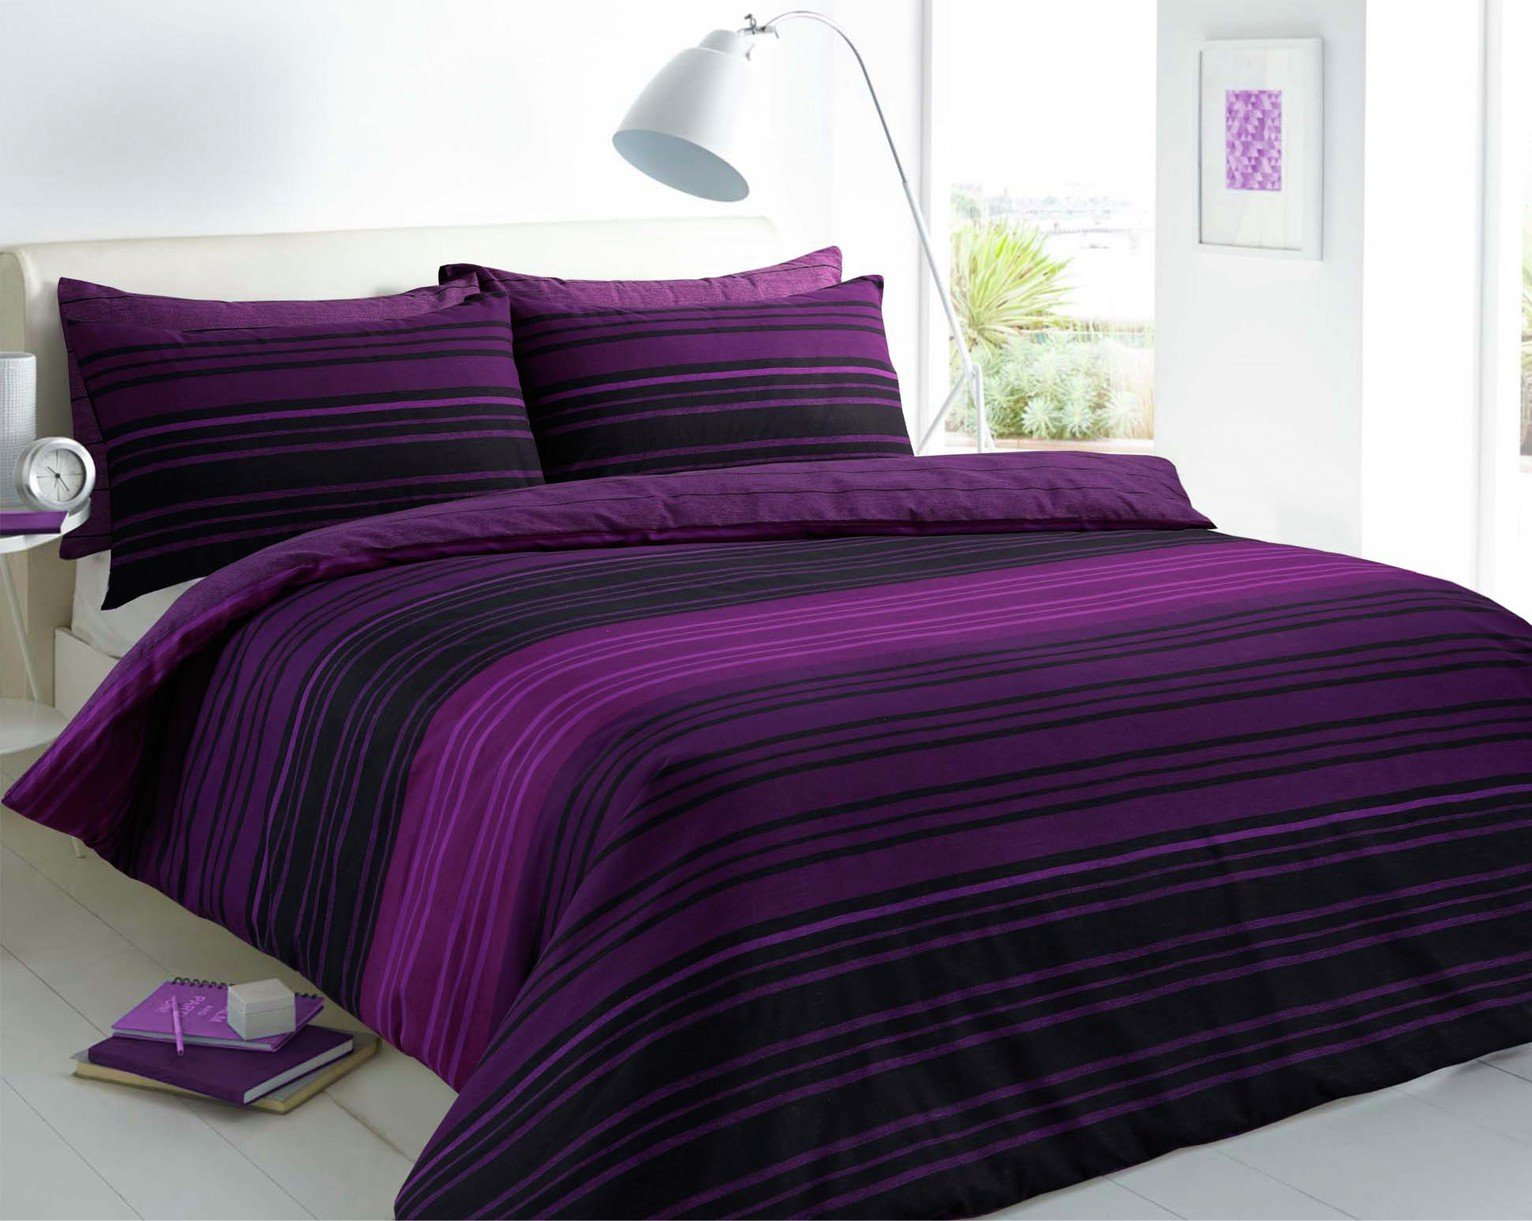 Pieridae Purple Textured Striped Bedding Set - Superking